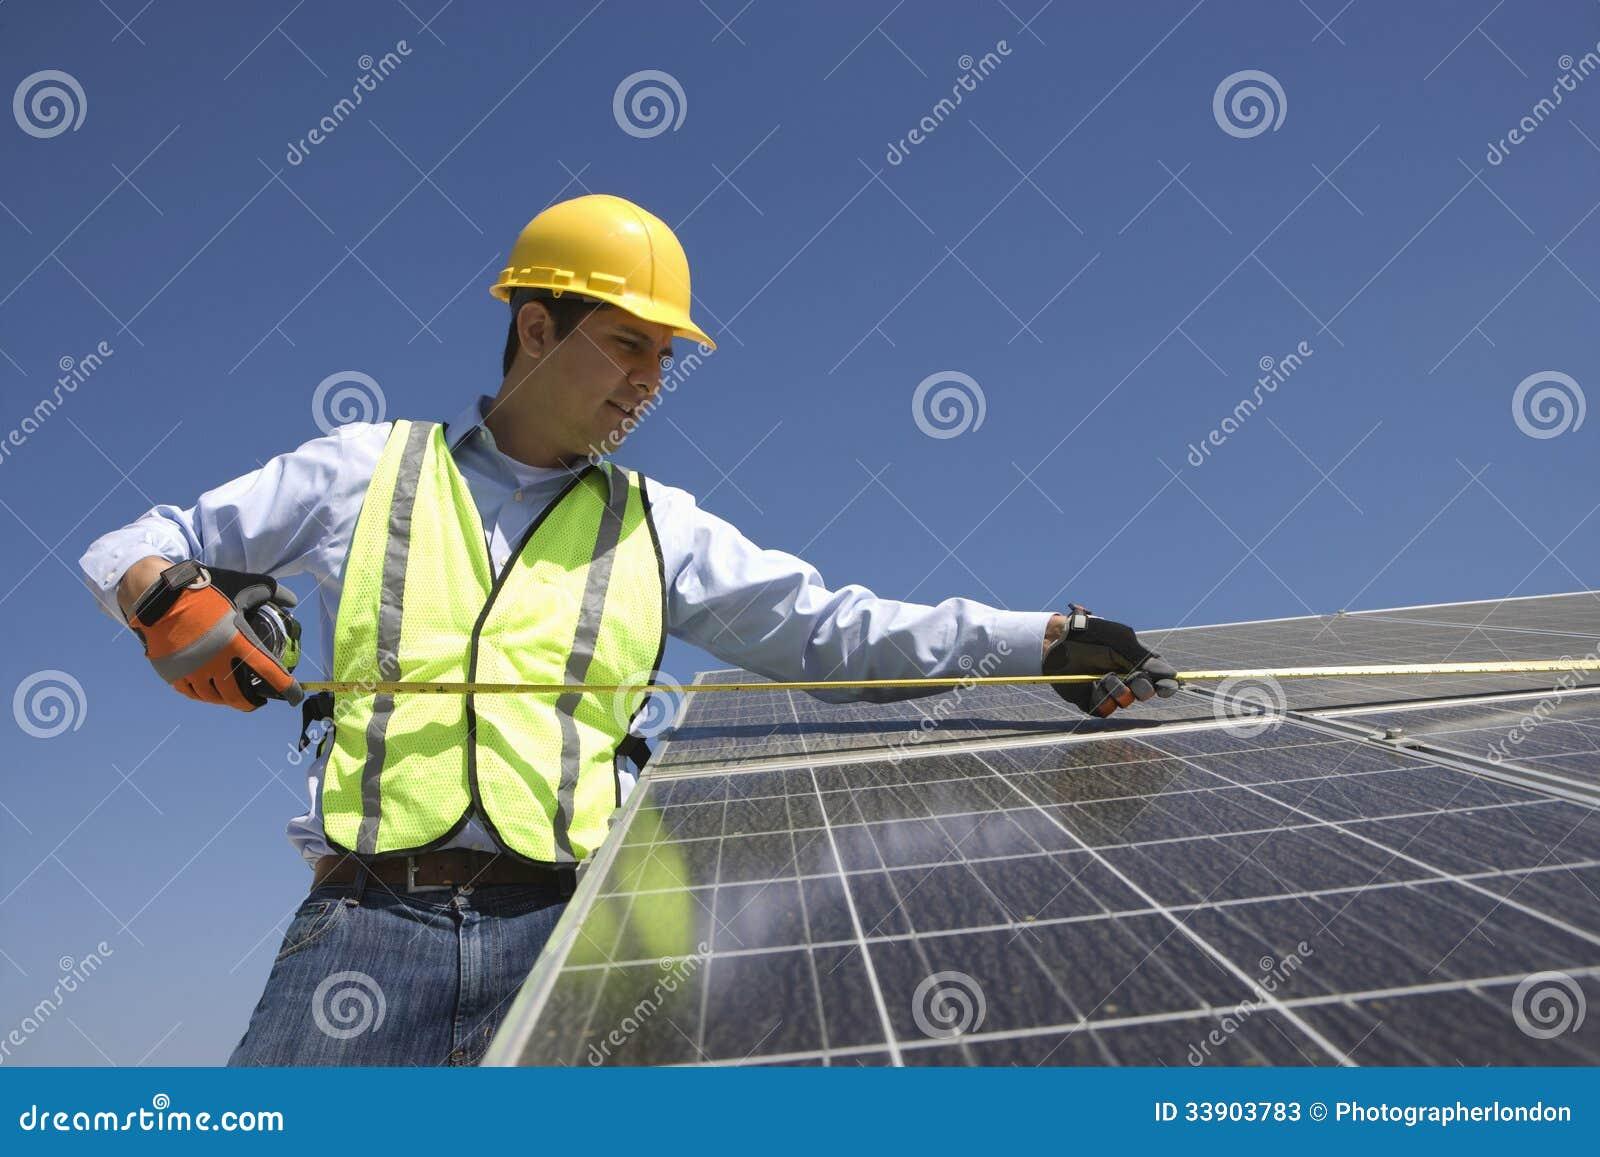 Maintenance Worker Measuring Solar Cells Stock Image